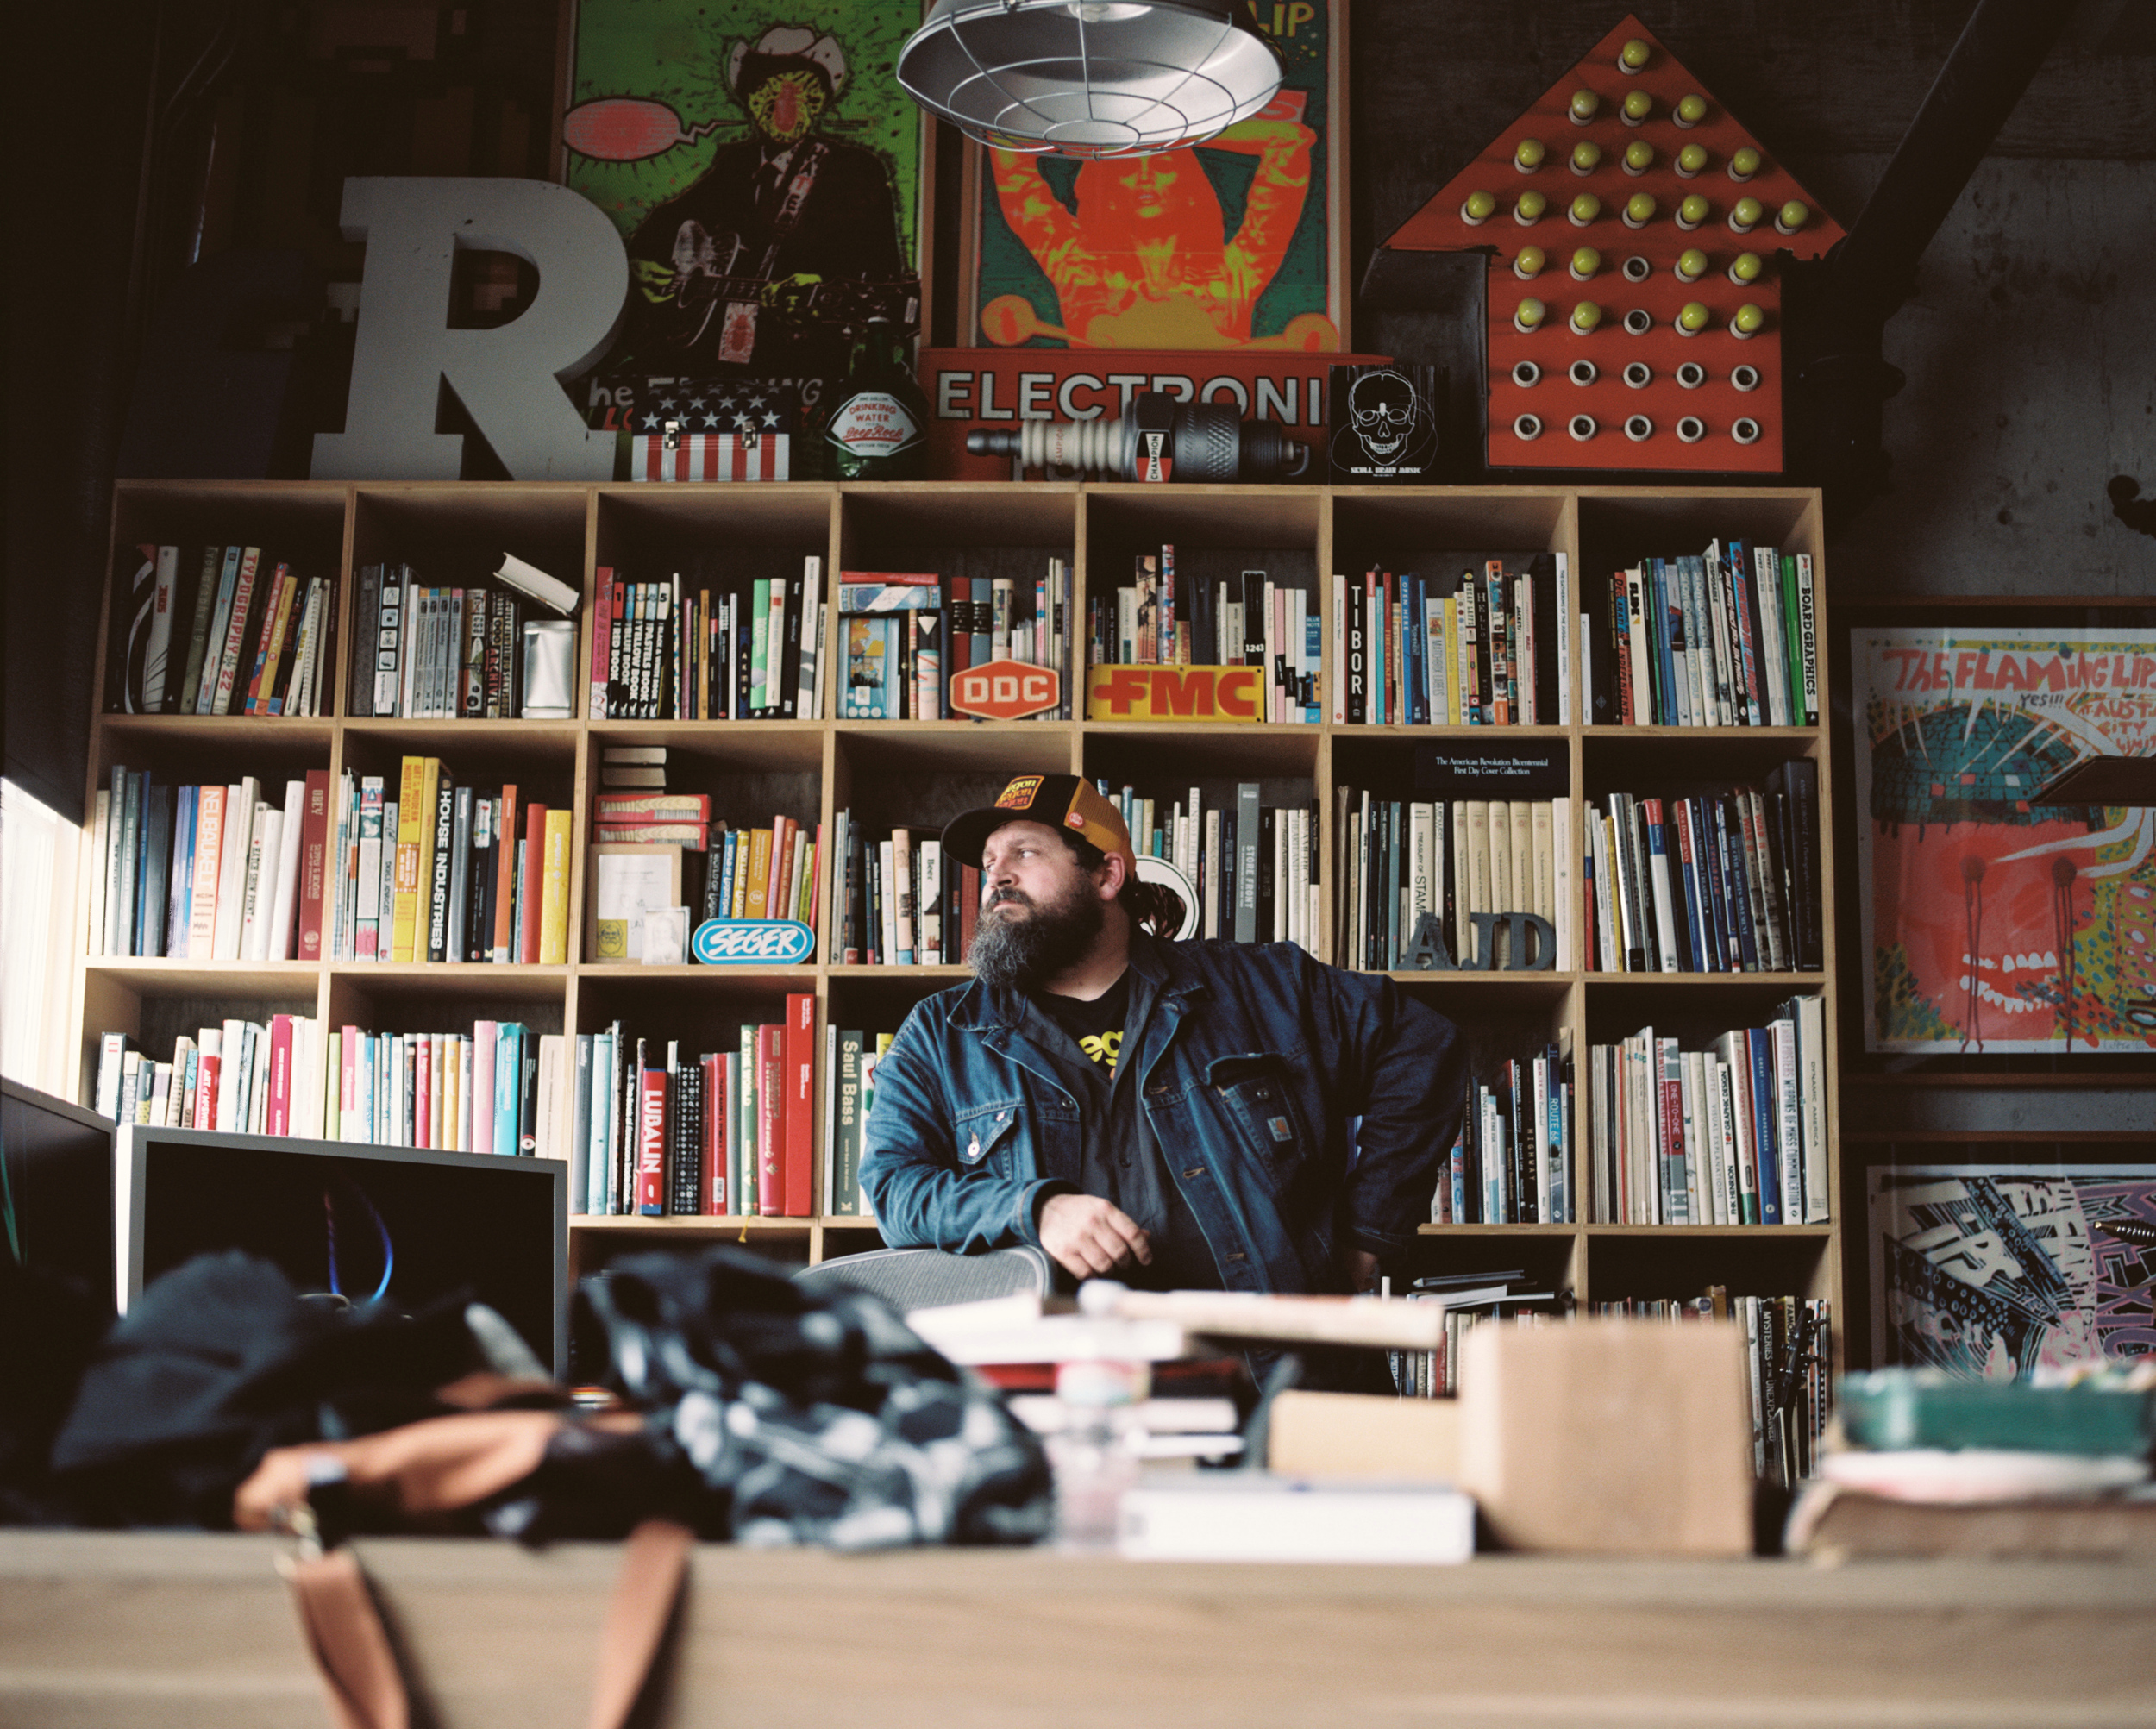 Aaron Draplin (designer)